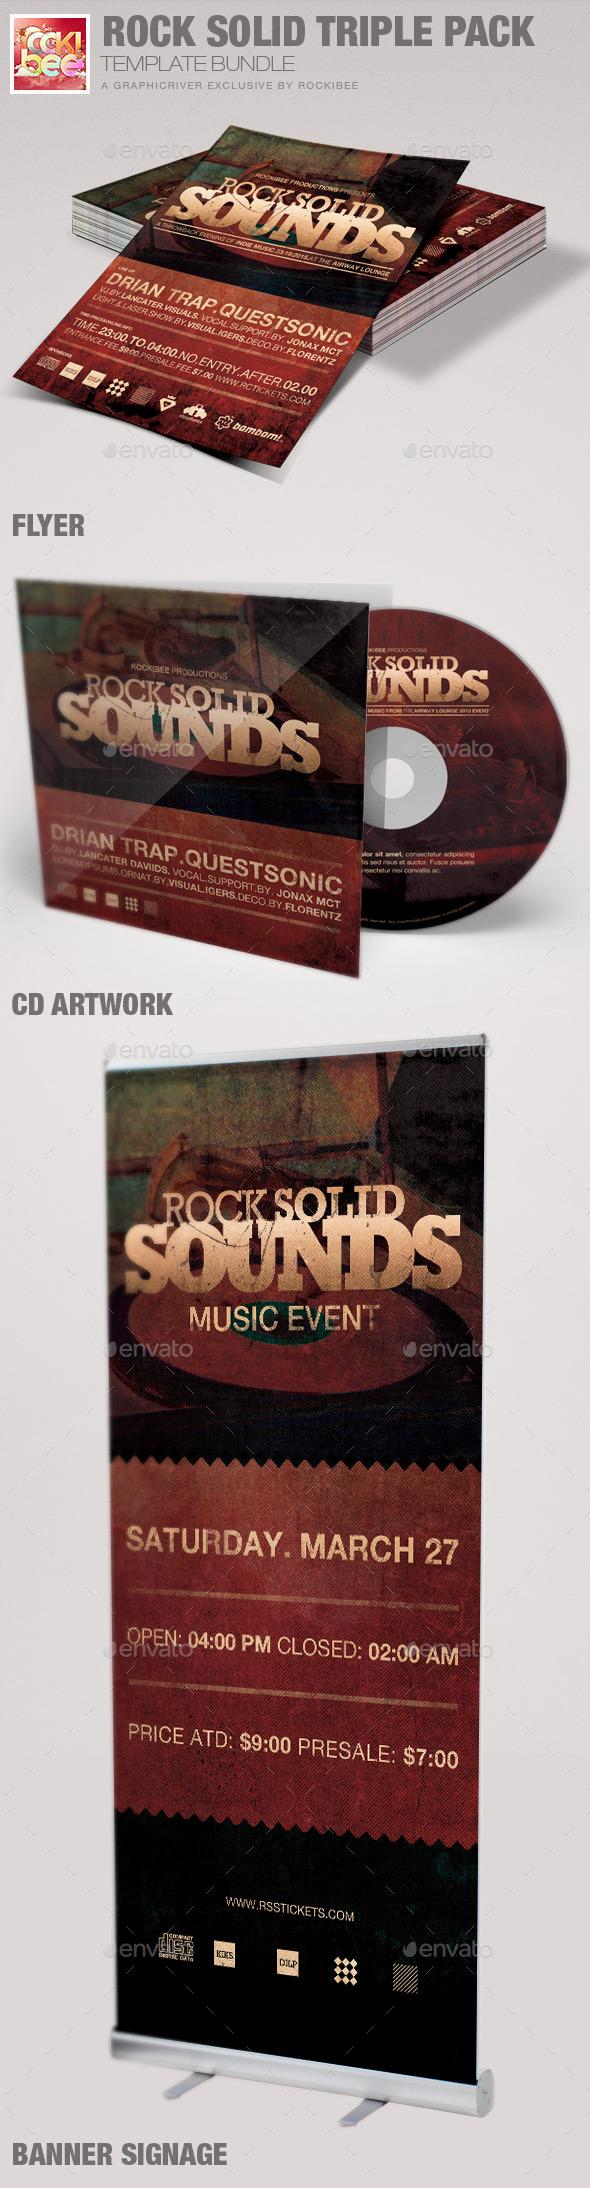 Rock Solid Triple Pack Template Bundle - Miscellaneous Events